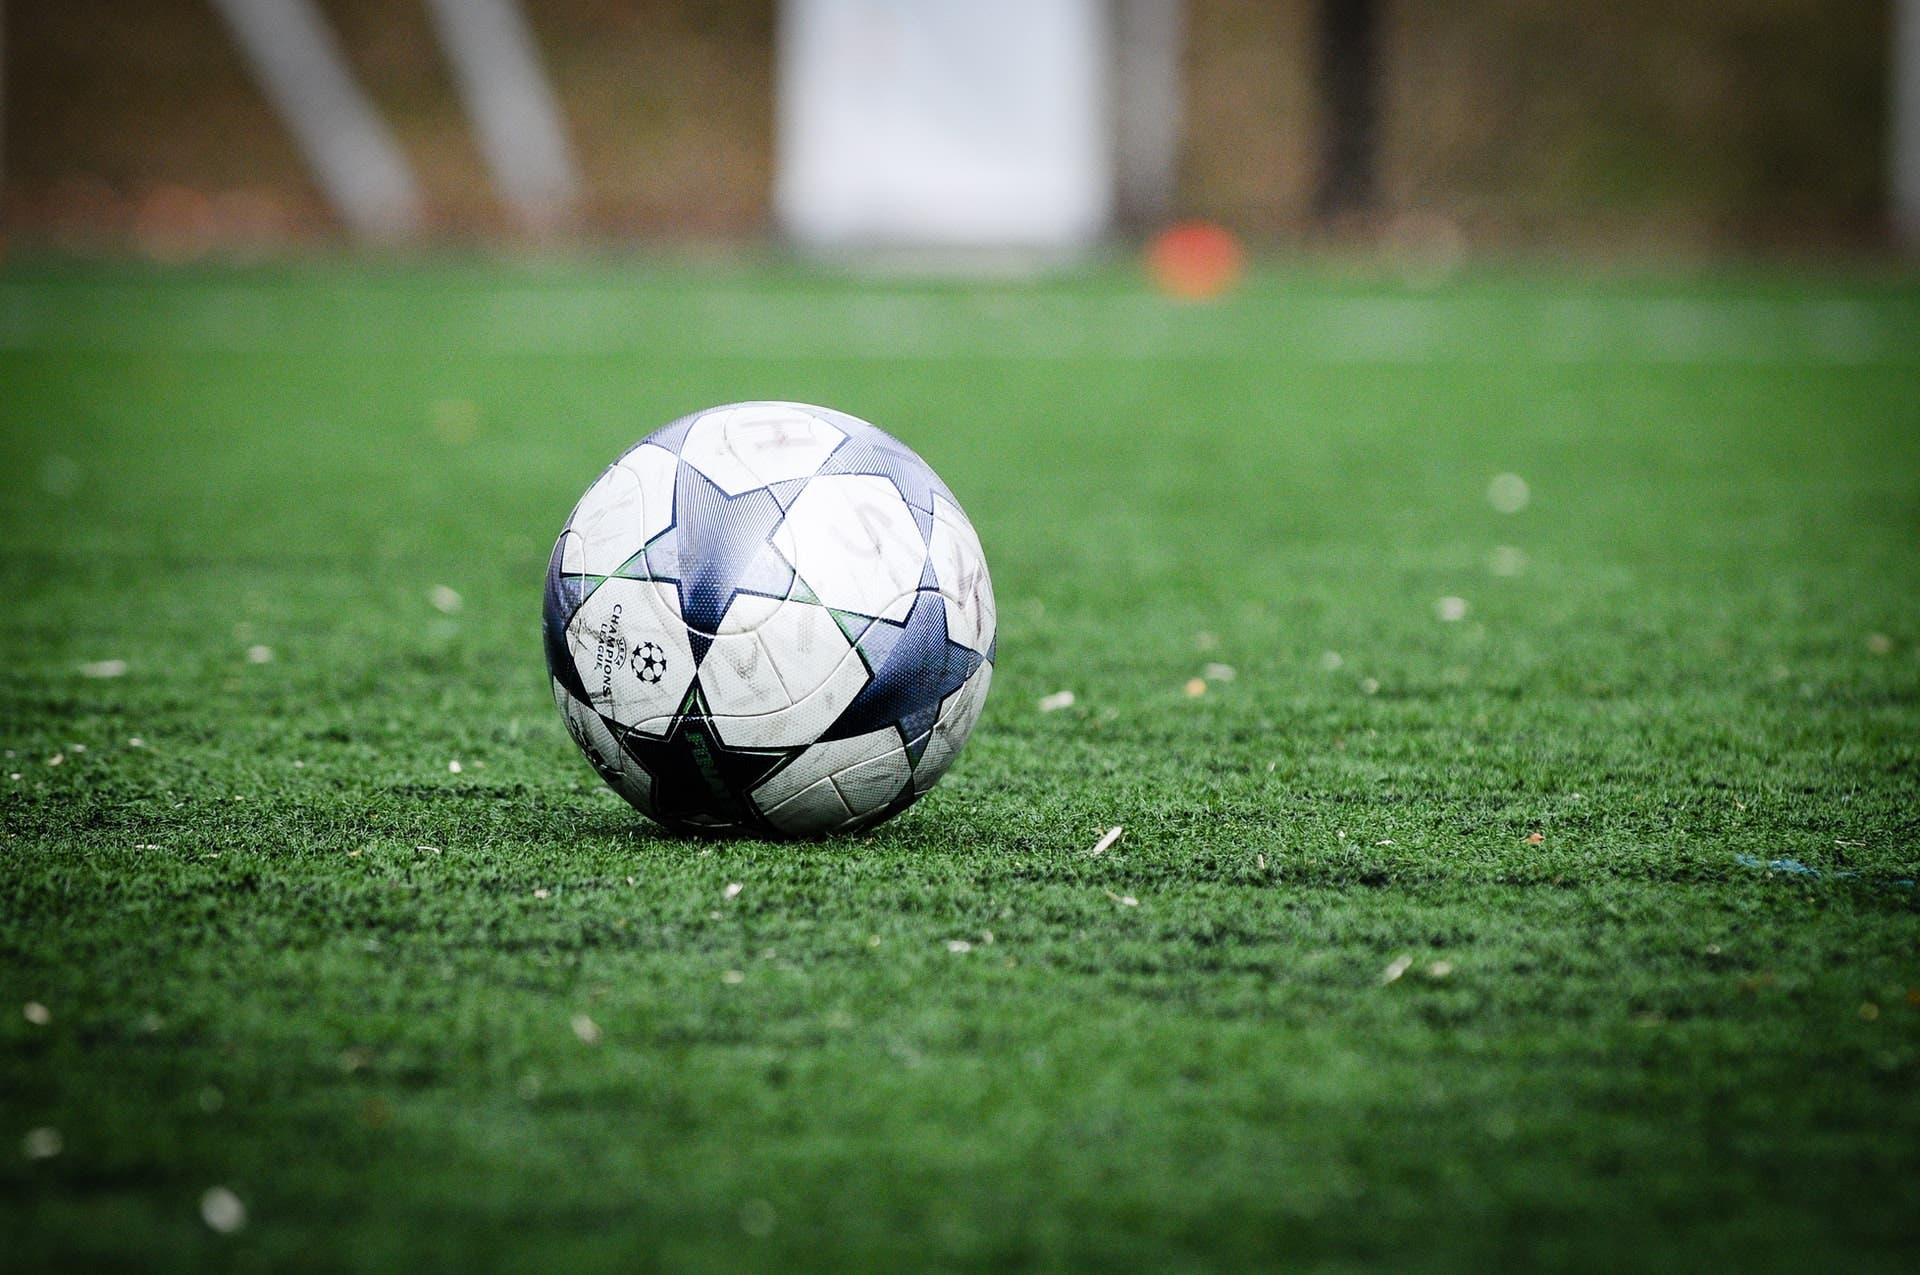 Football by Daniel Norin Unsplash